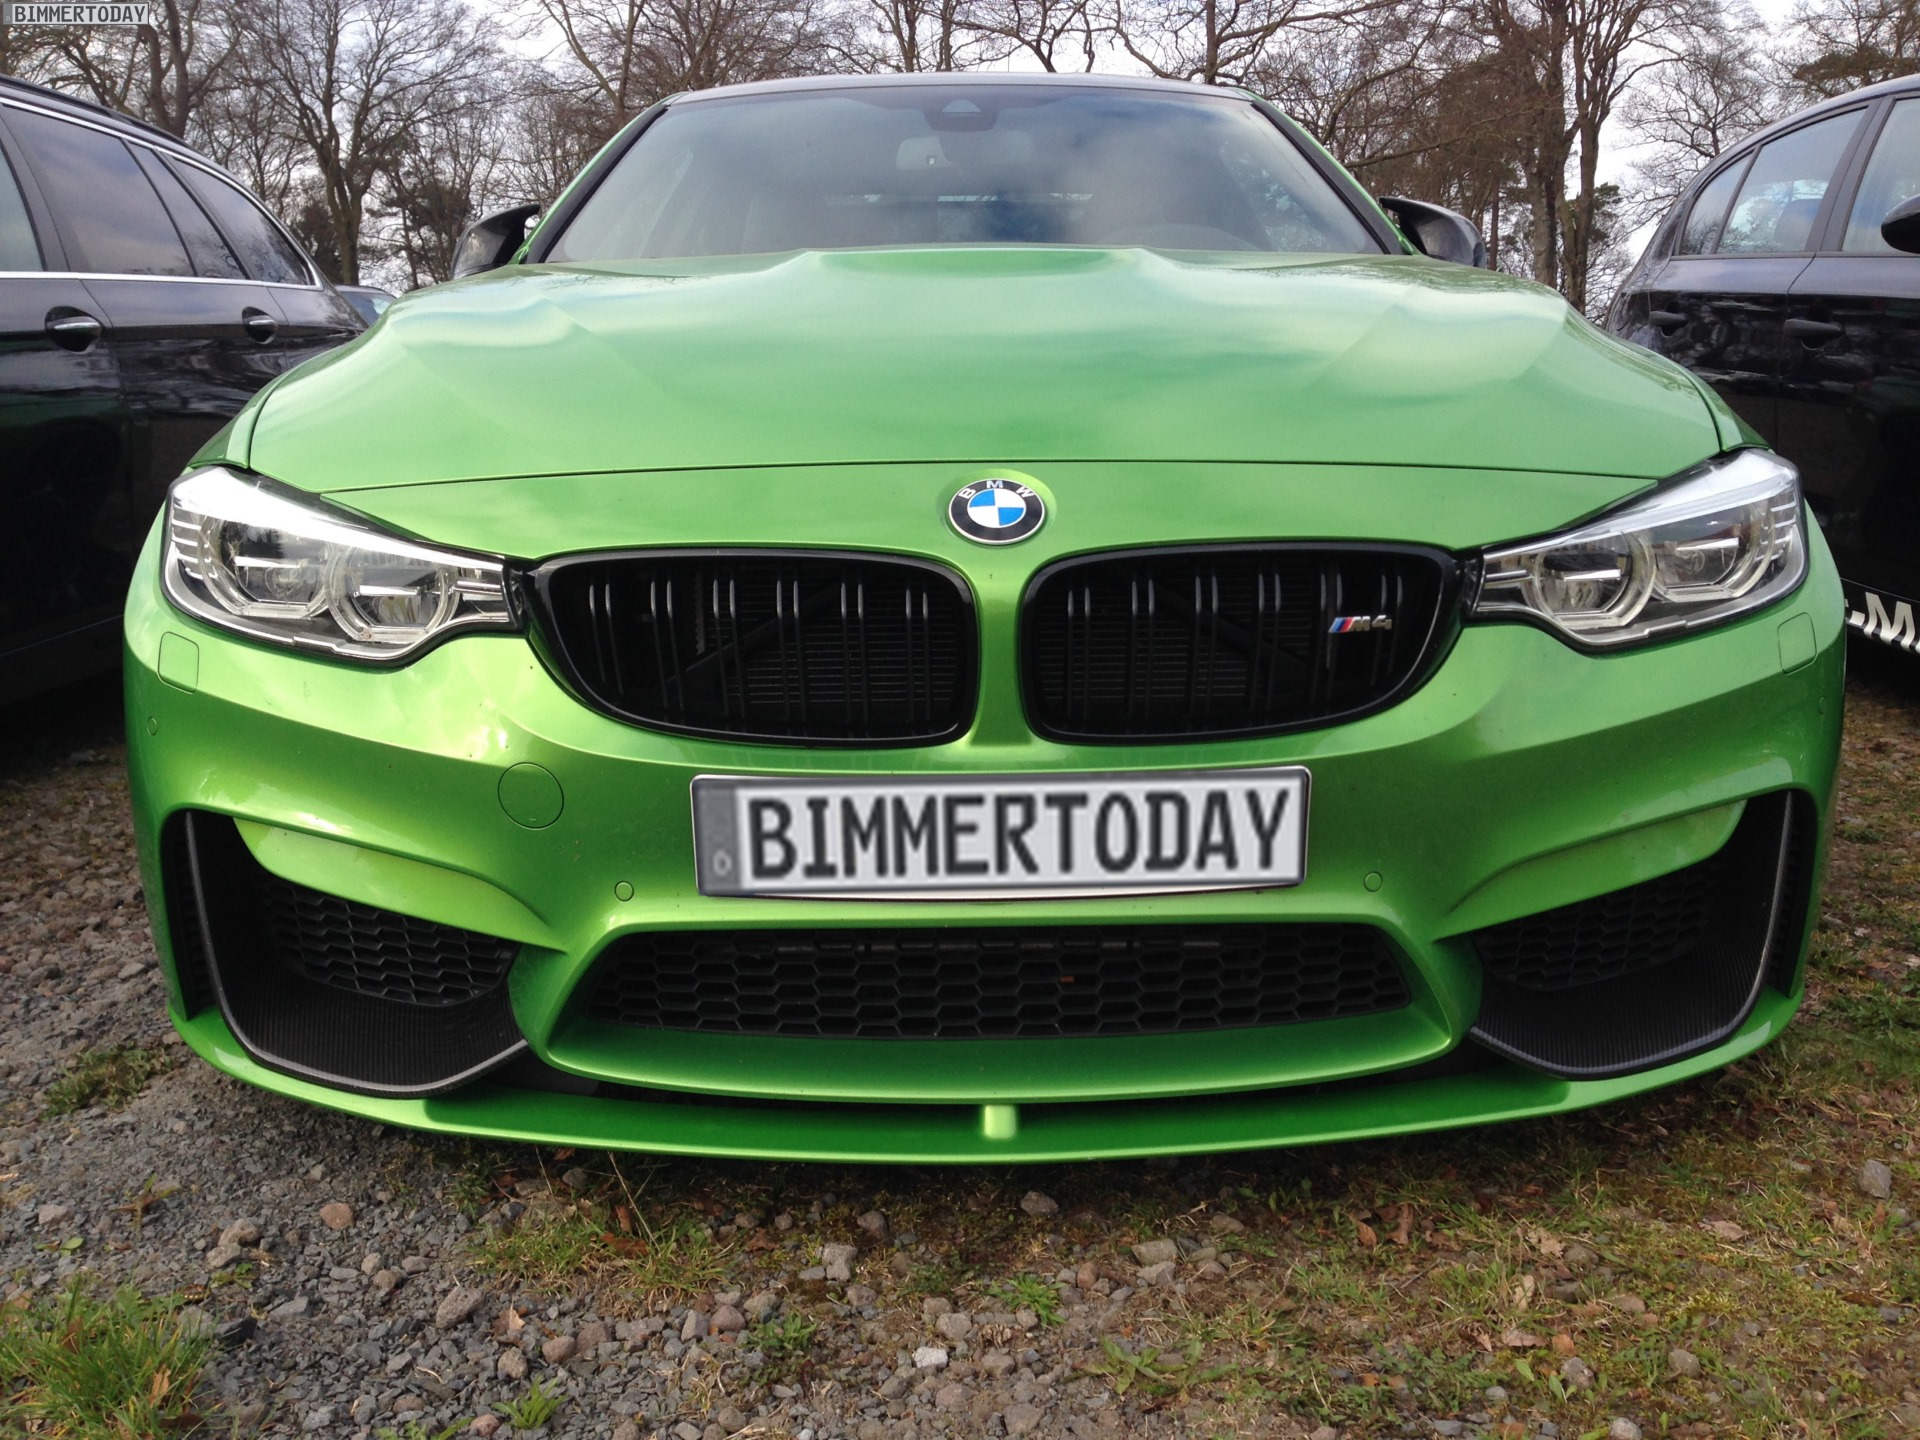 BMW M4 Java Gruen Tuning M Performance Marco Wittmann 02